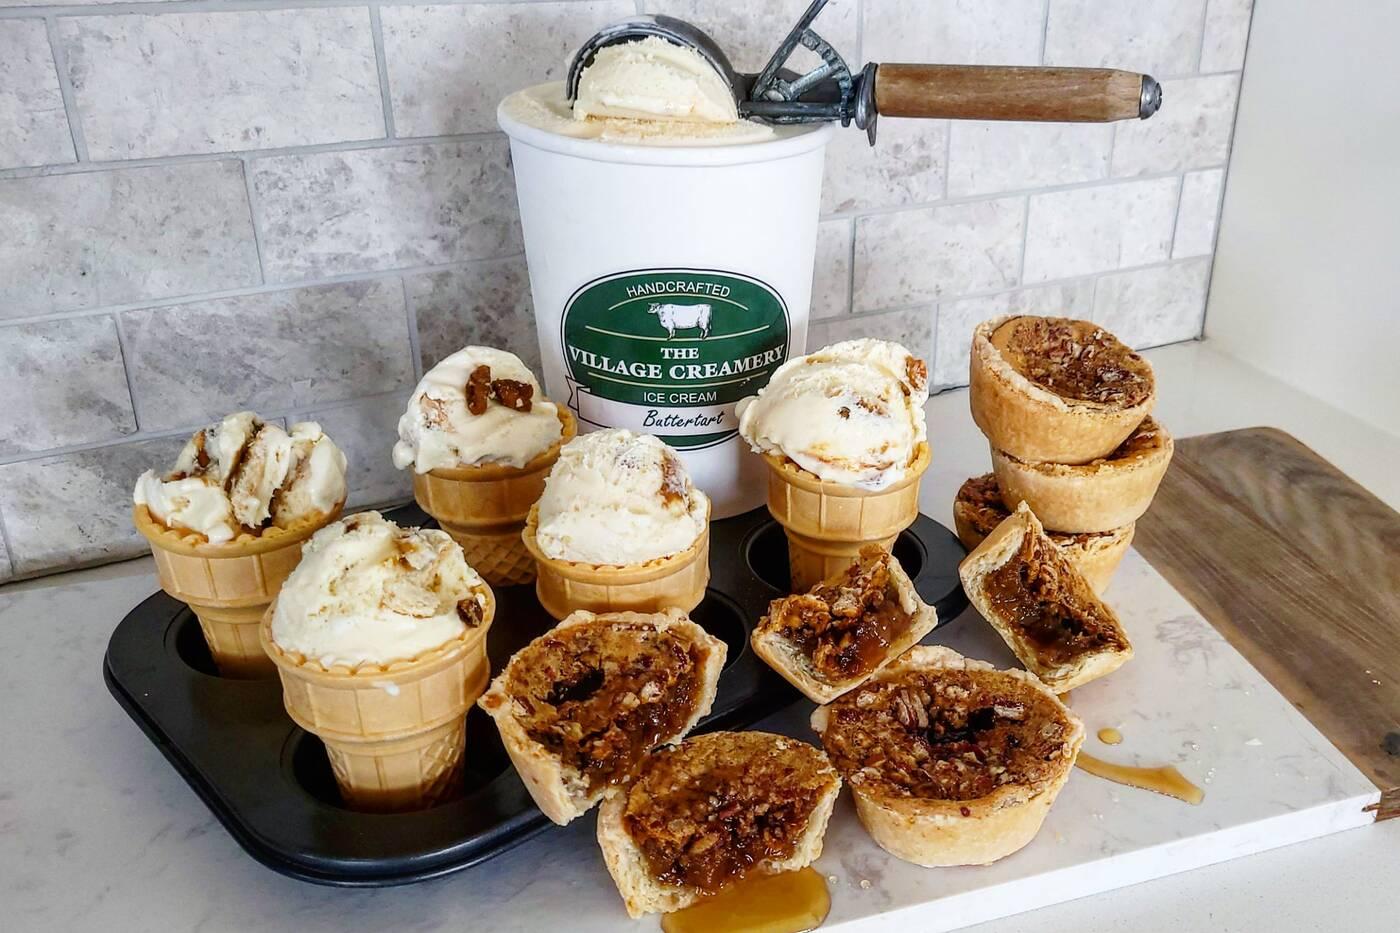 village creamery markham